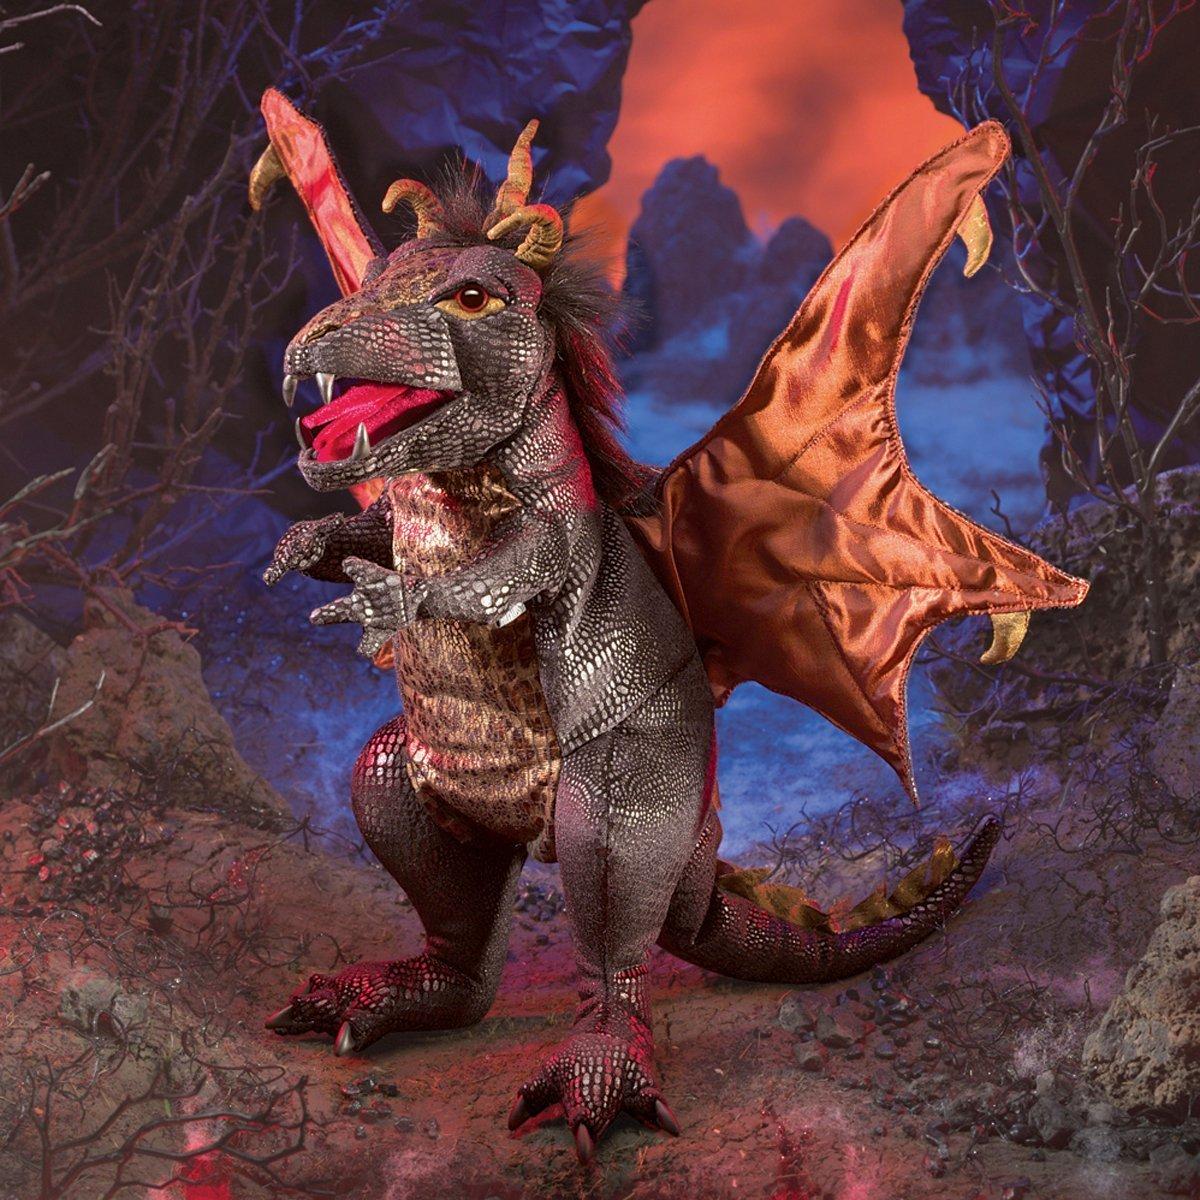 Folkmanis Hand Puppet - Black Dragon image